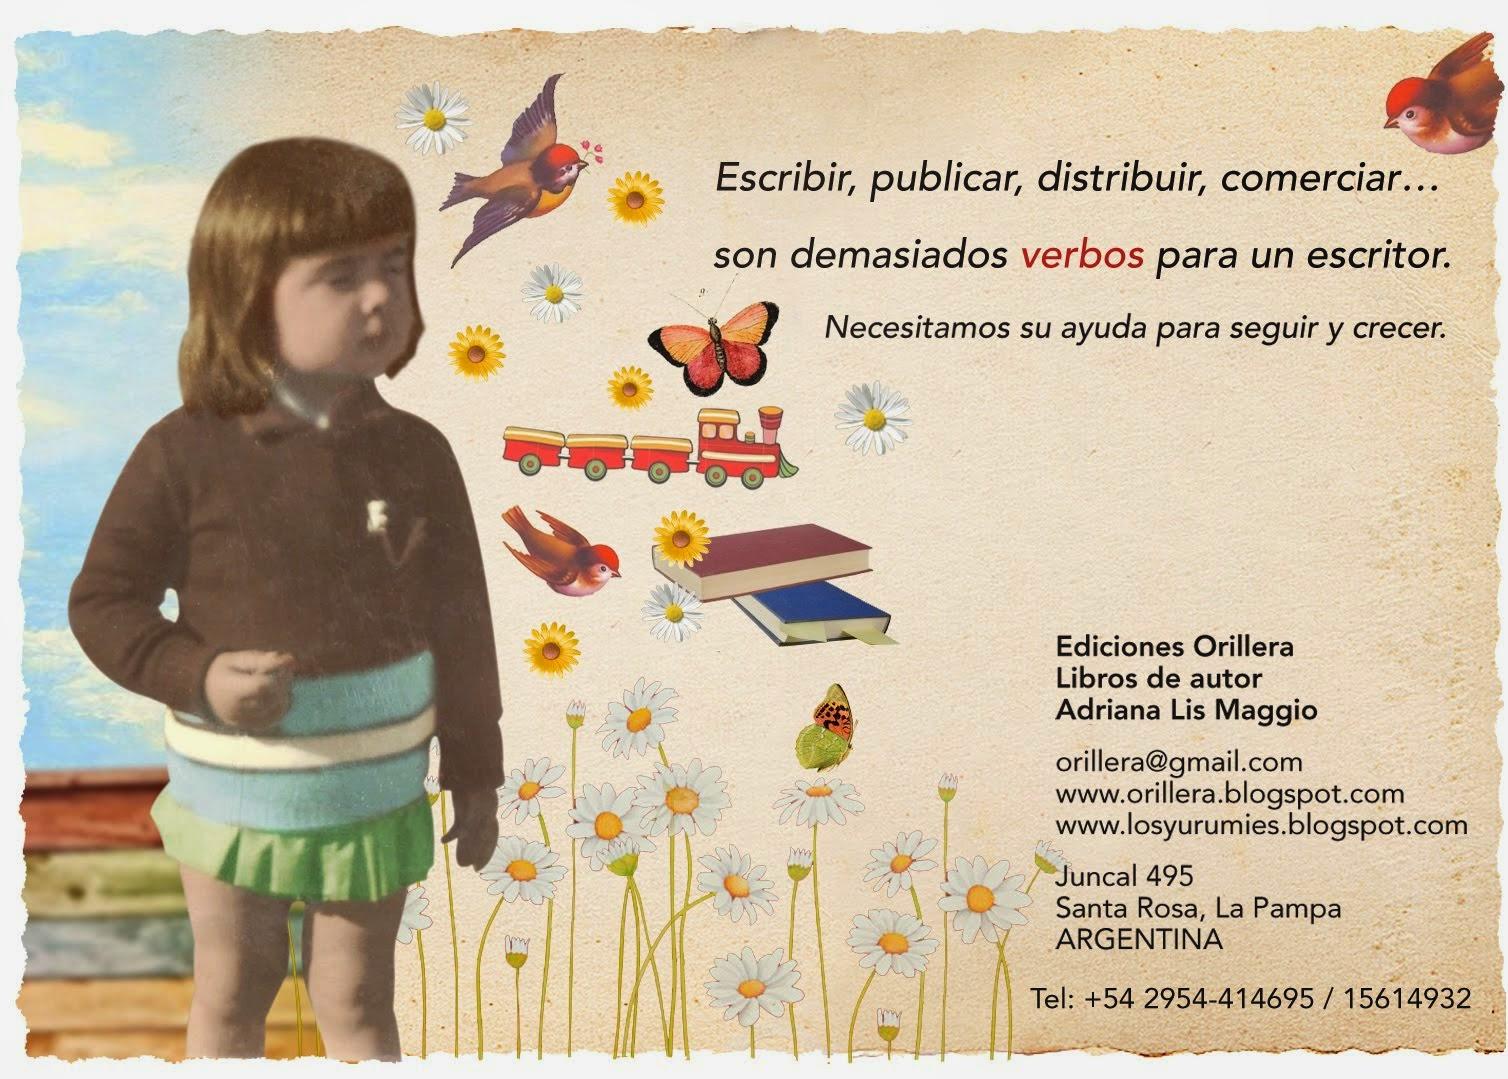 Ediciones Orillera. Santa Rosa. La Pampa.